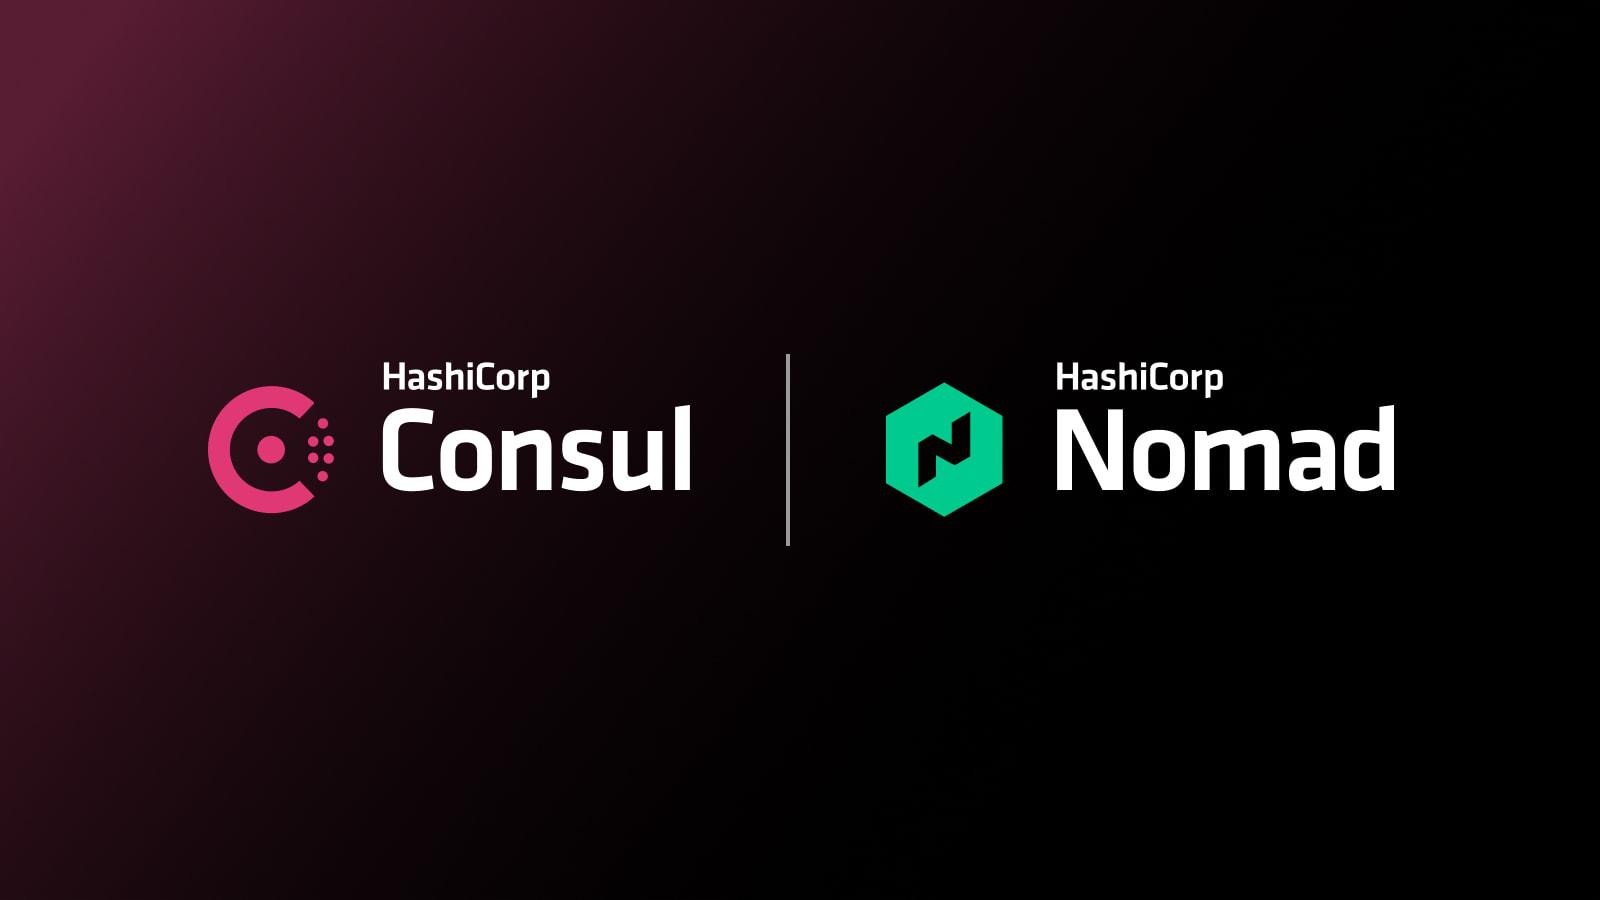 HashiTalks 2021 Highlights: Nomad and Consul